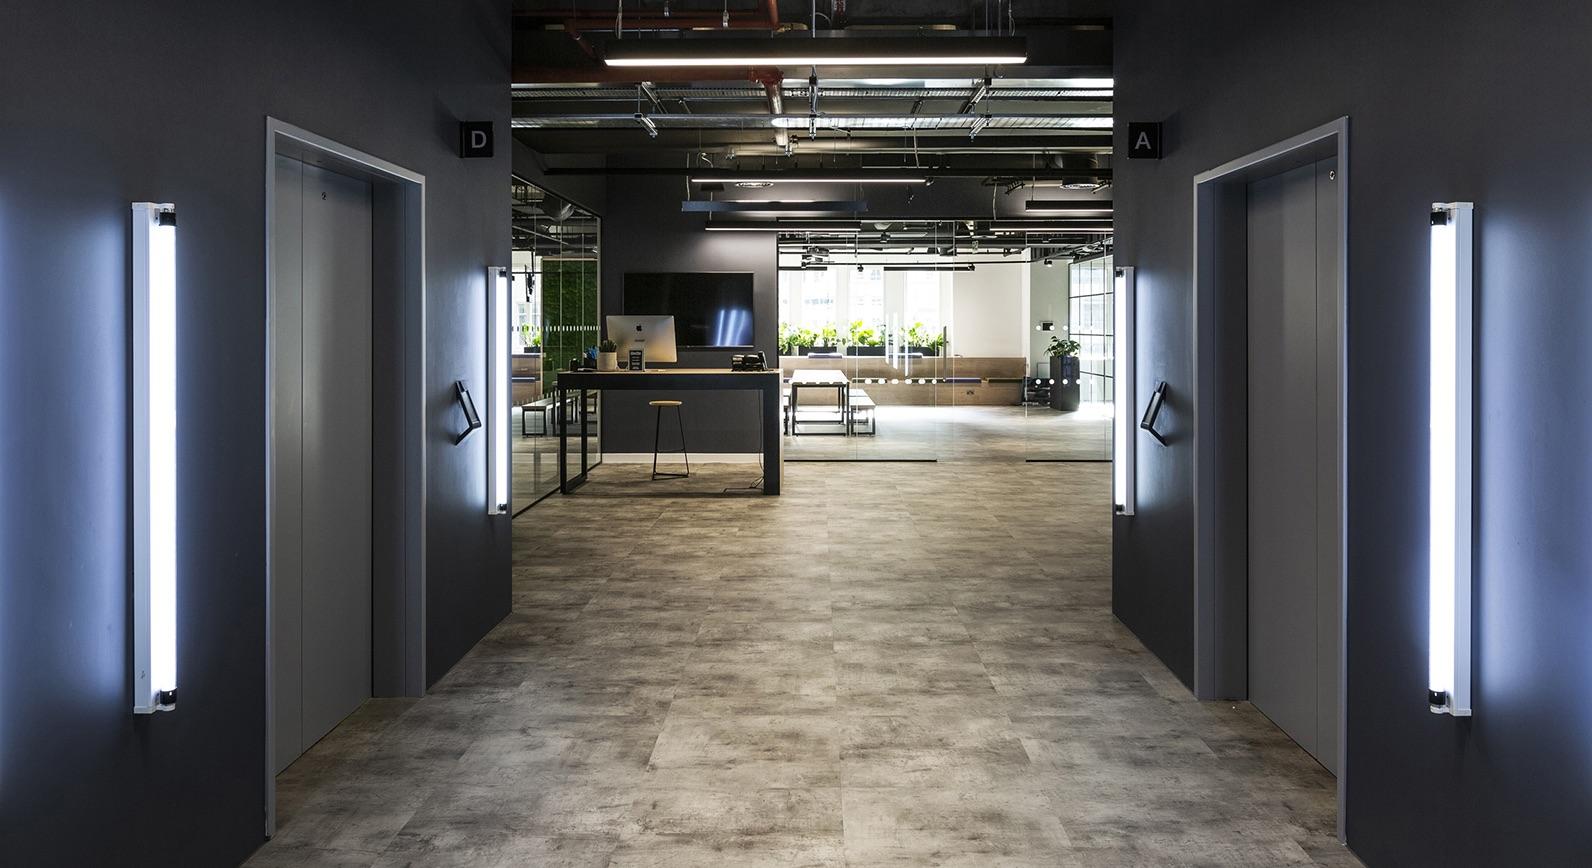 revolut-office-london-5